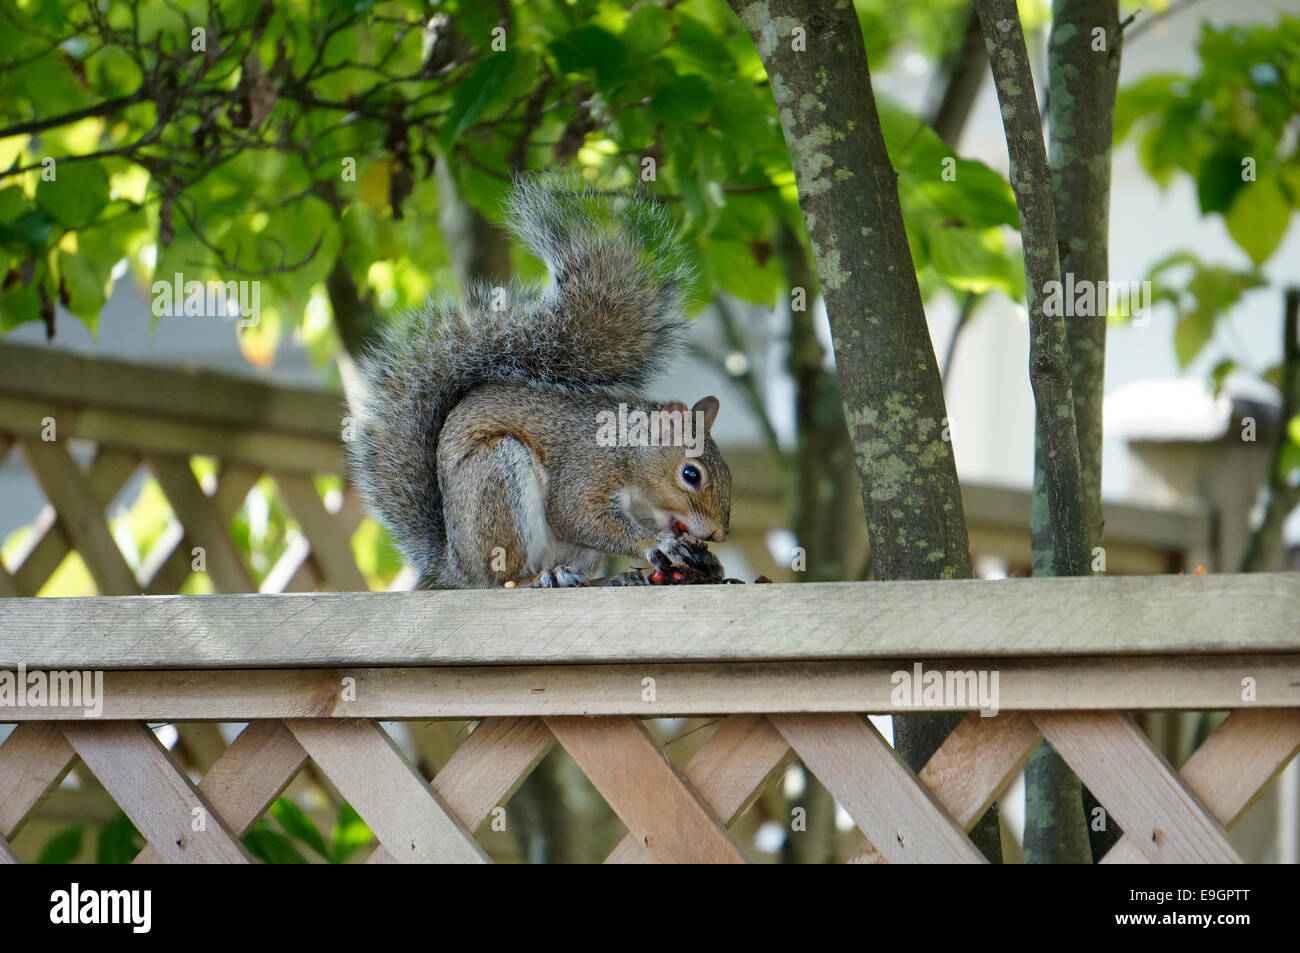 western-gray-squirrel-sciurus-griseus-sitting-on-a-wooden-backyard-E9GPTT.jpg